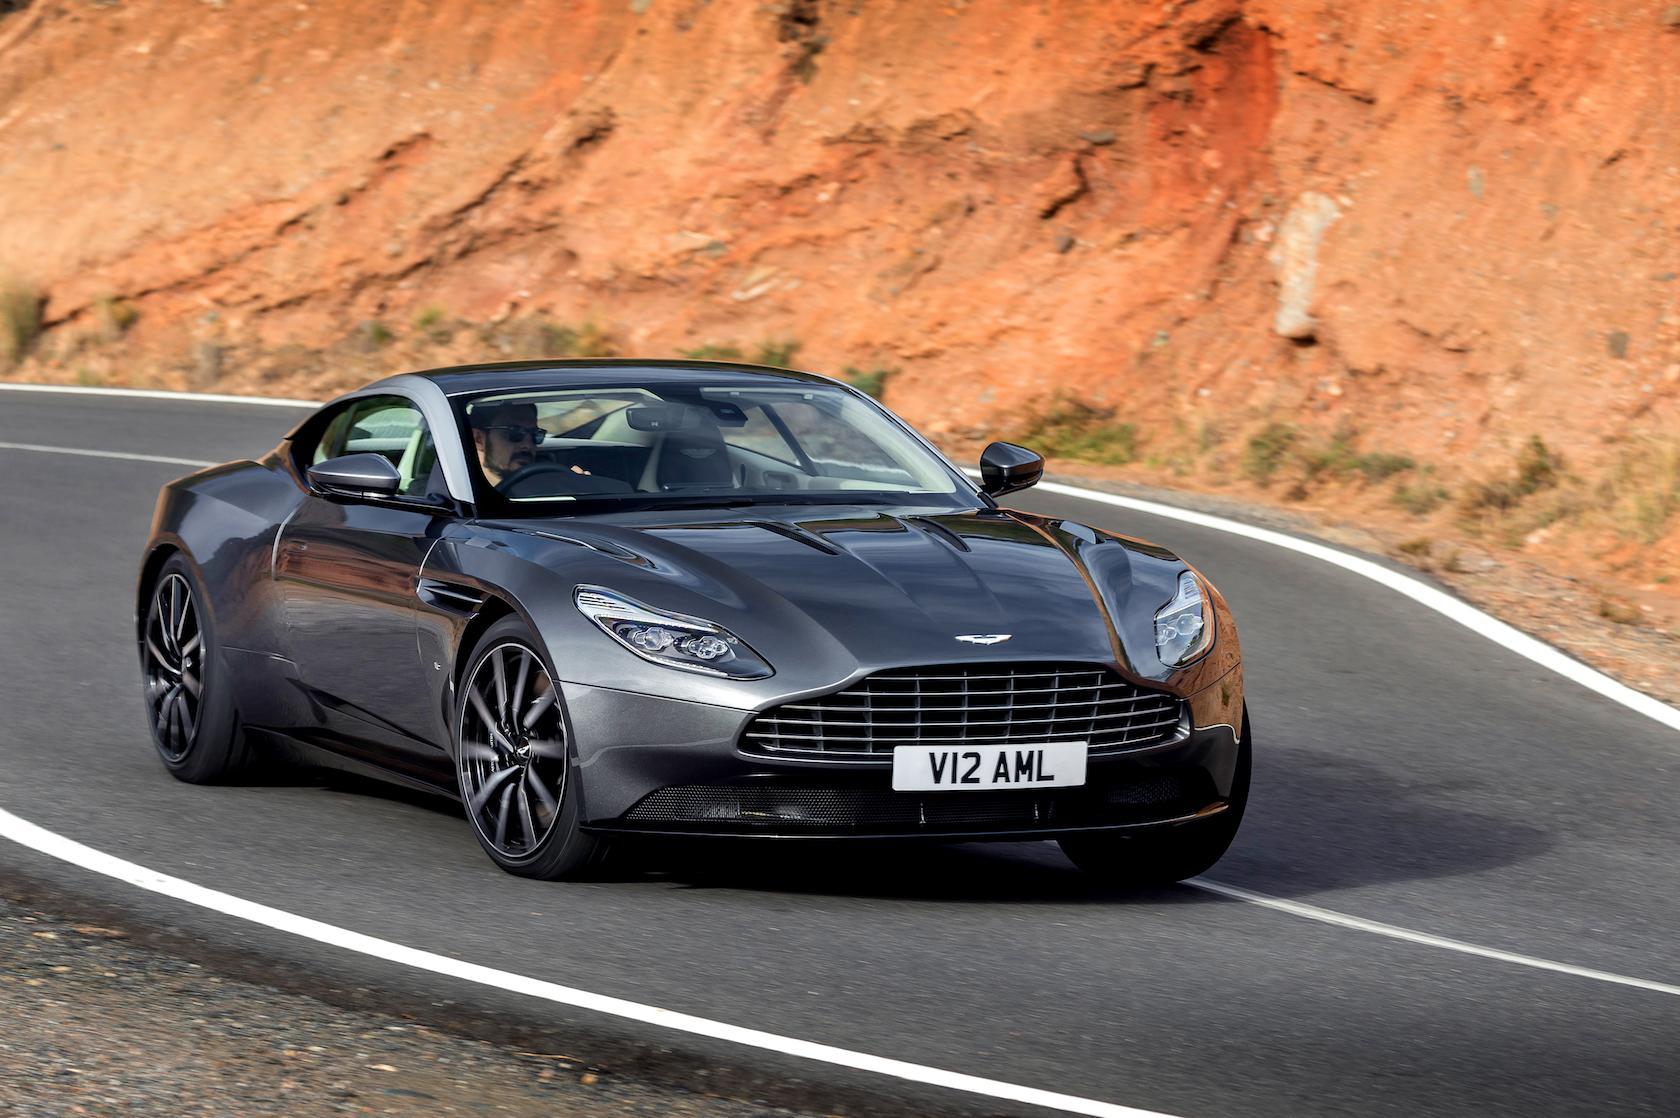 Aston Martin DB11_Embargo 010316 1400CET_12